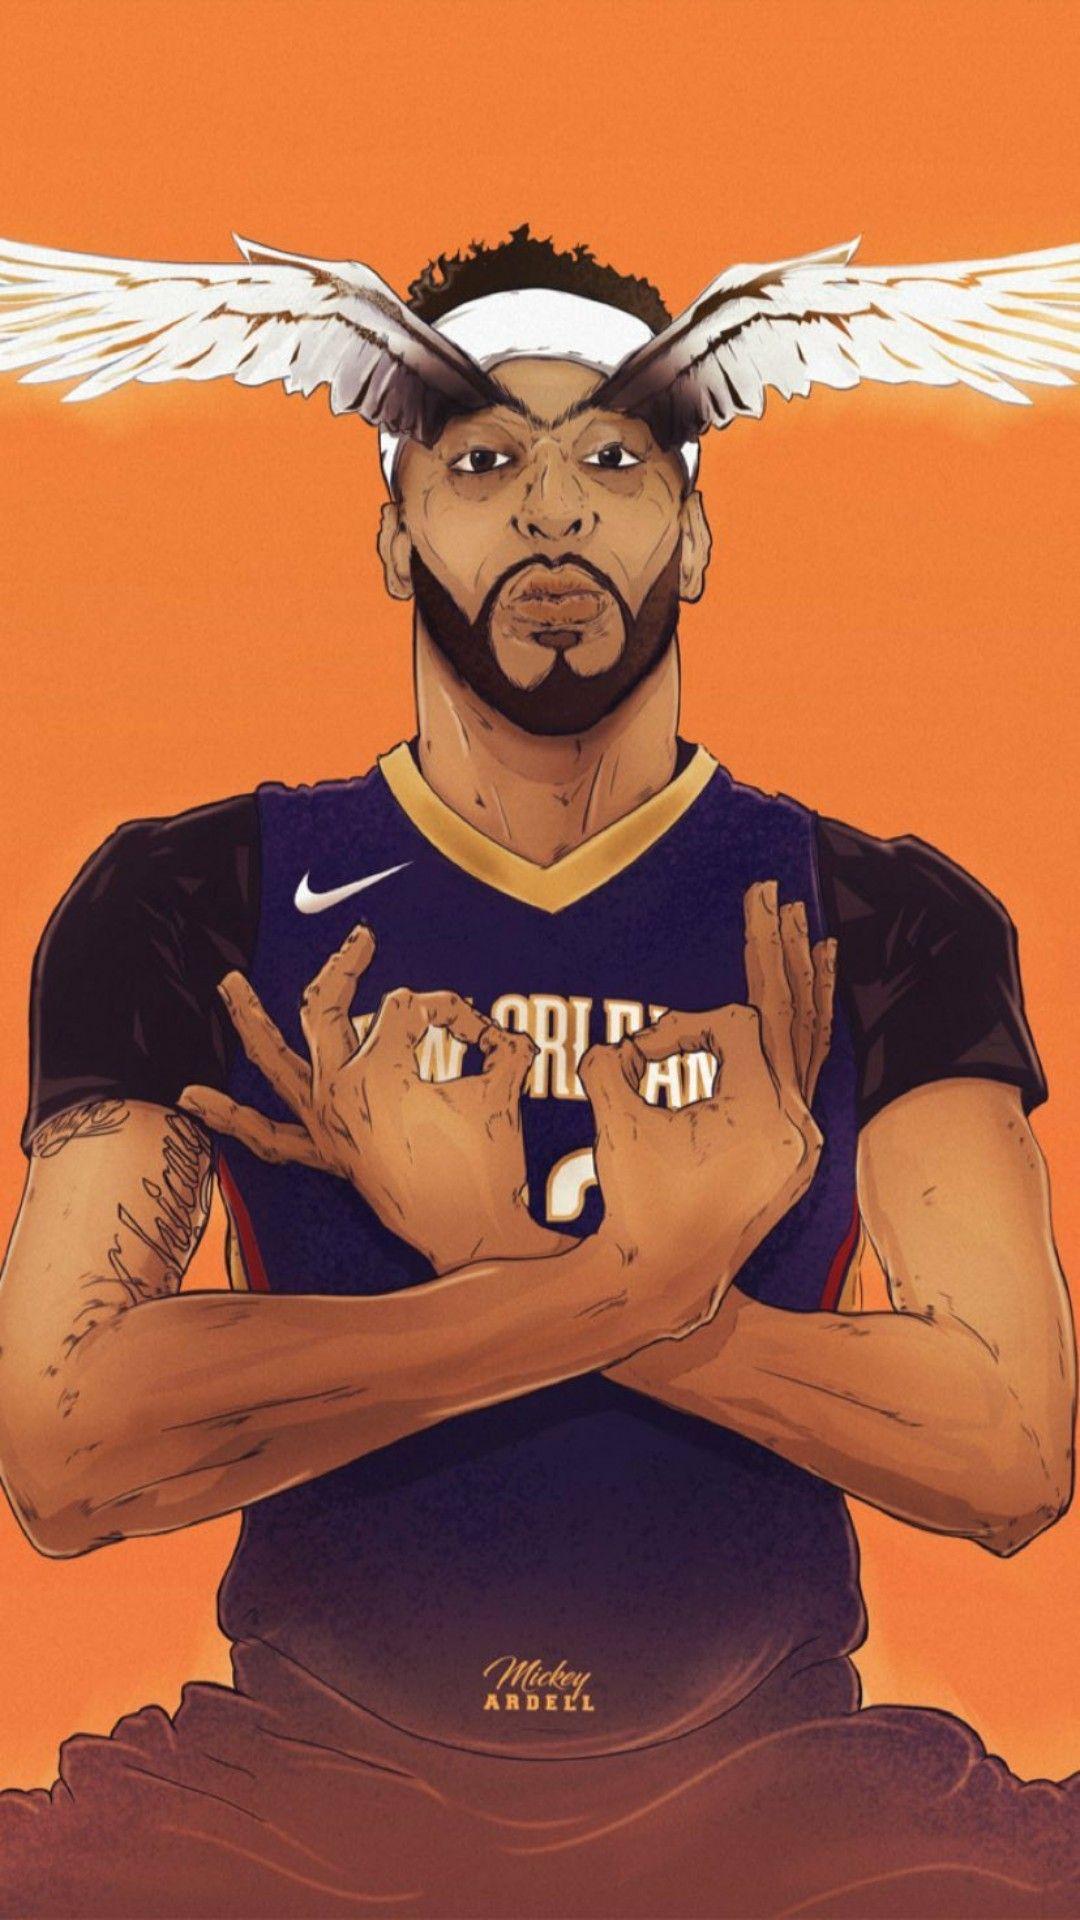 Anthony Davis Wallpaper BASKETBALL Bryant basketball Nba 1080x1920